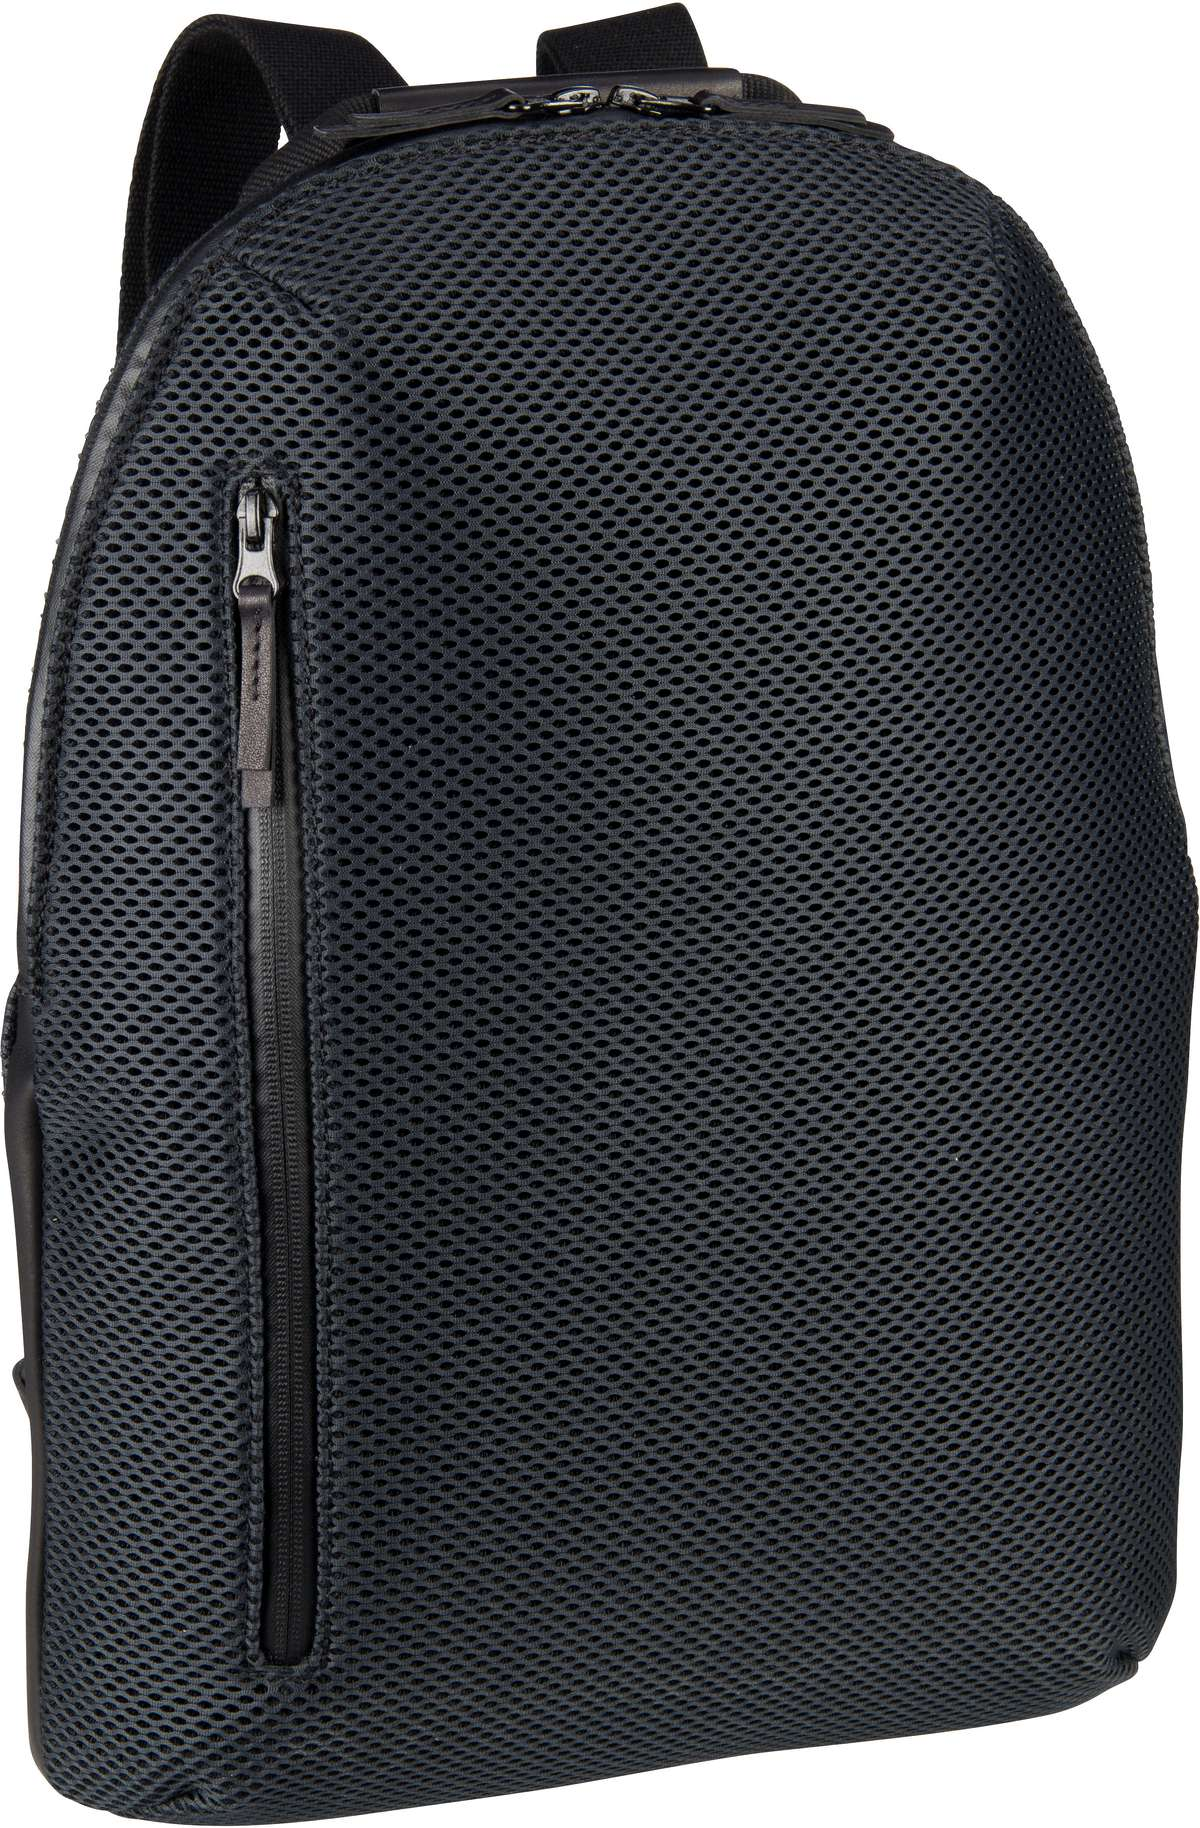 Jost Rucksack / Daypack Mesh 6188 Daypack Black